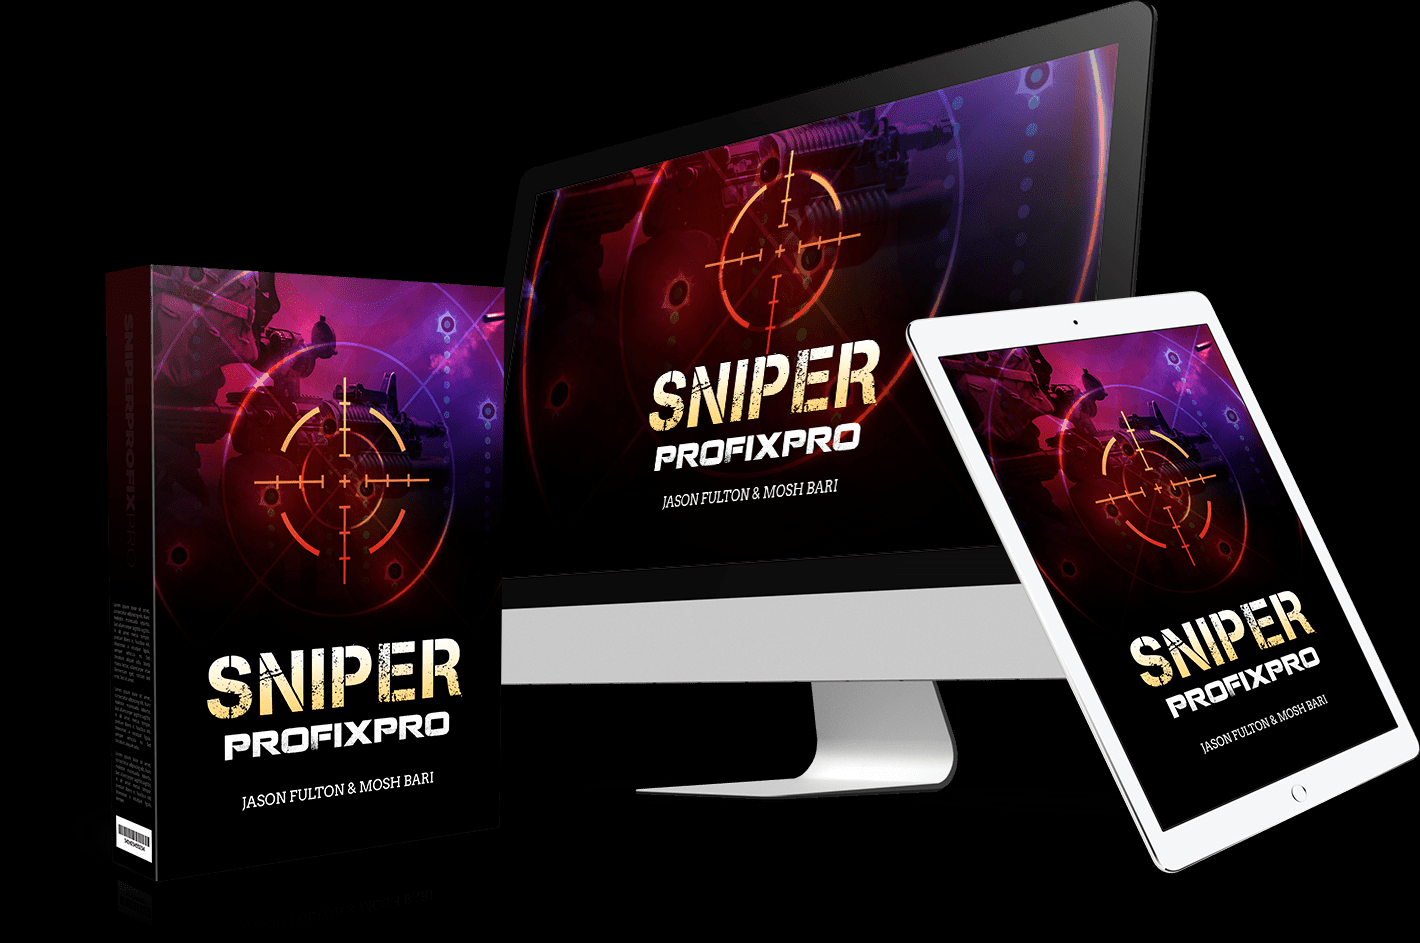 SniperProfixPro